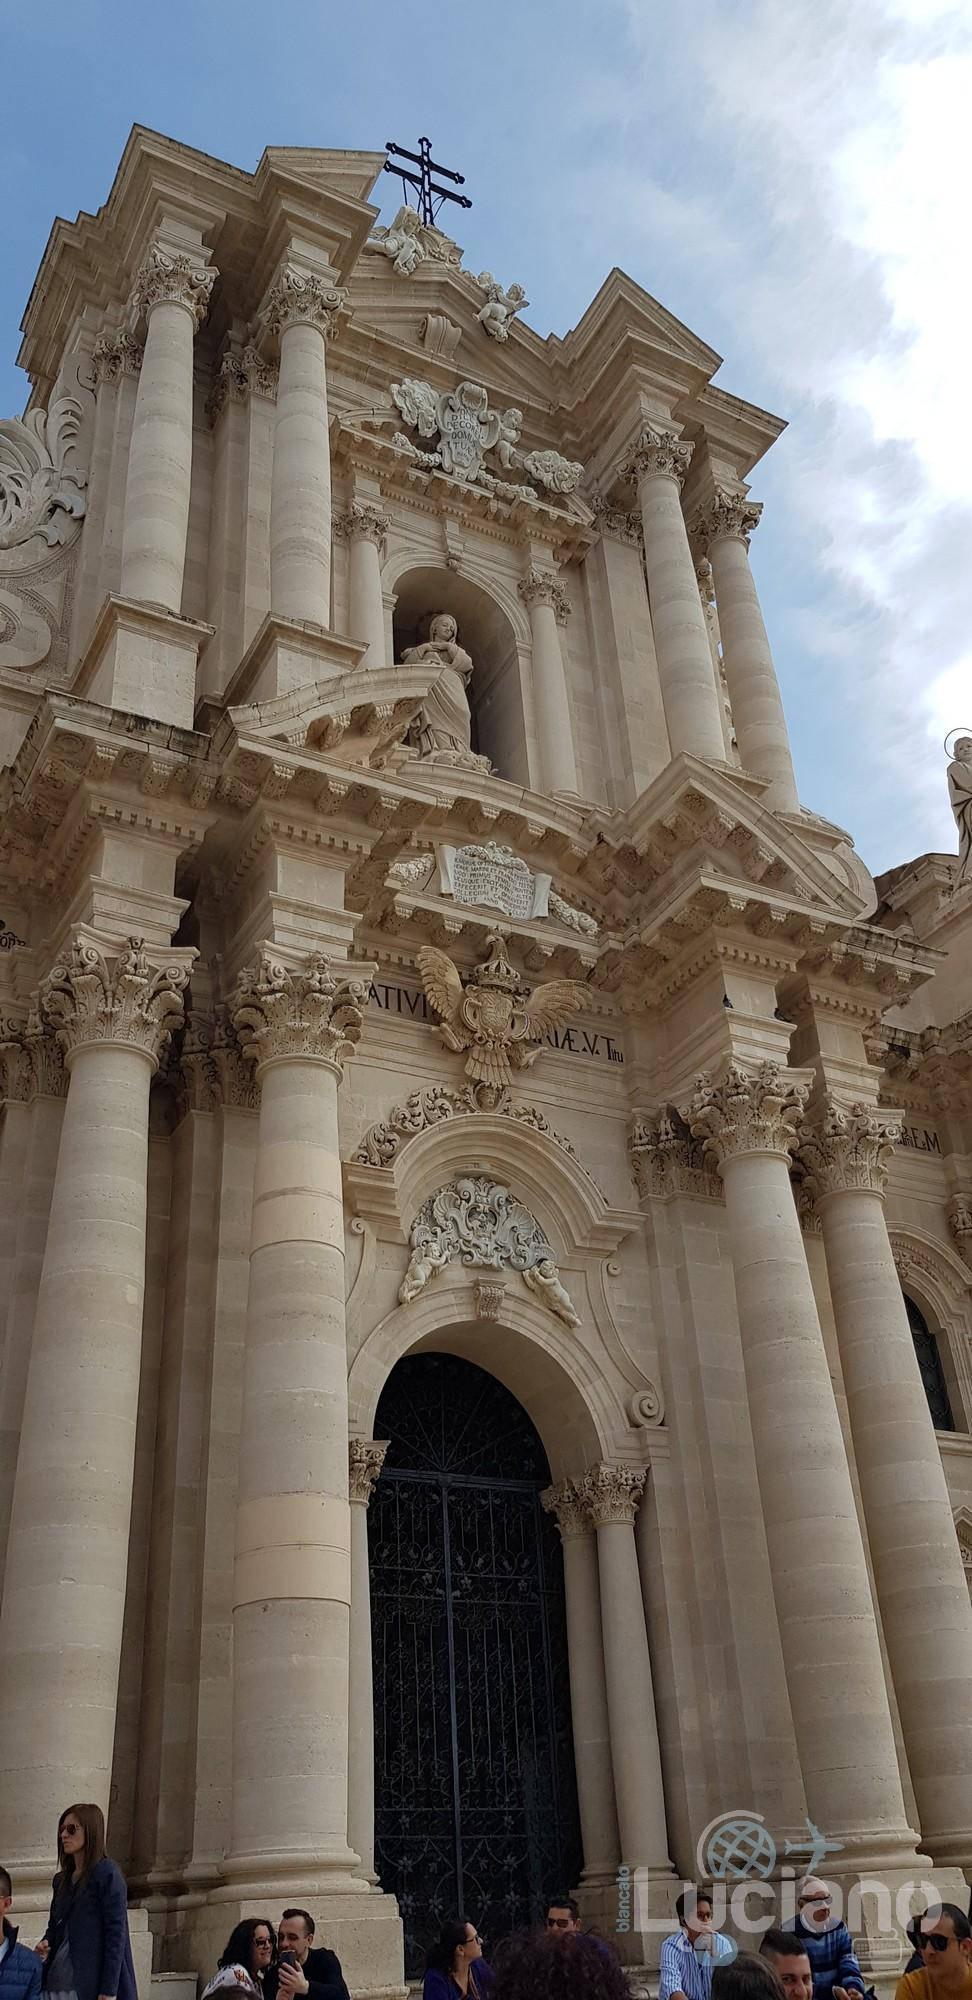 Siracusa - Duomo di Siracusa - Ortigia